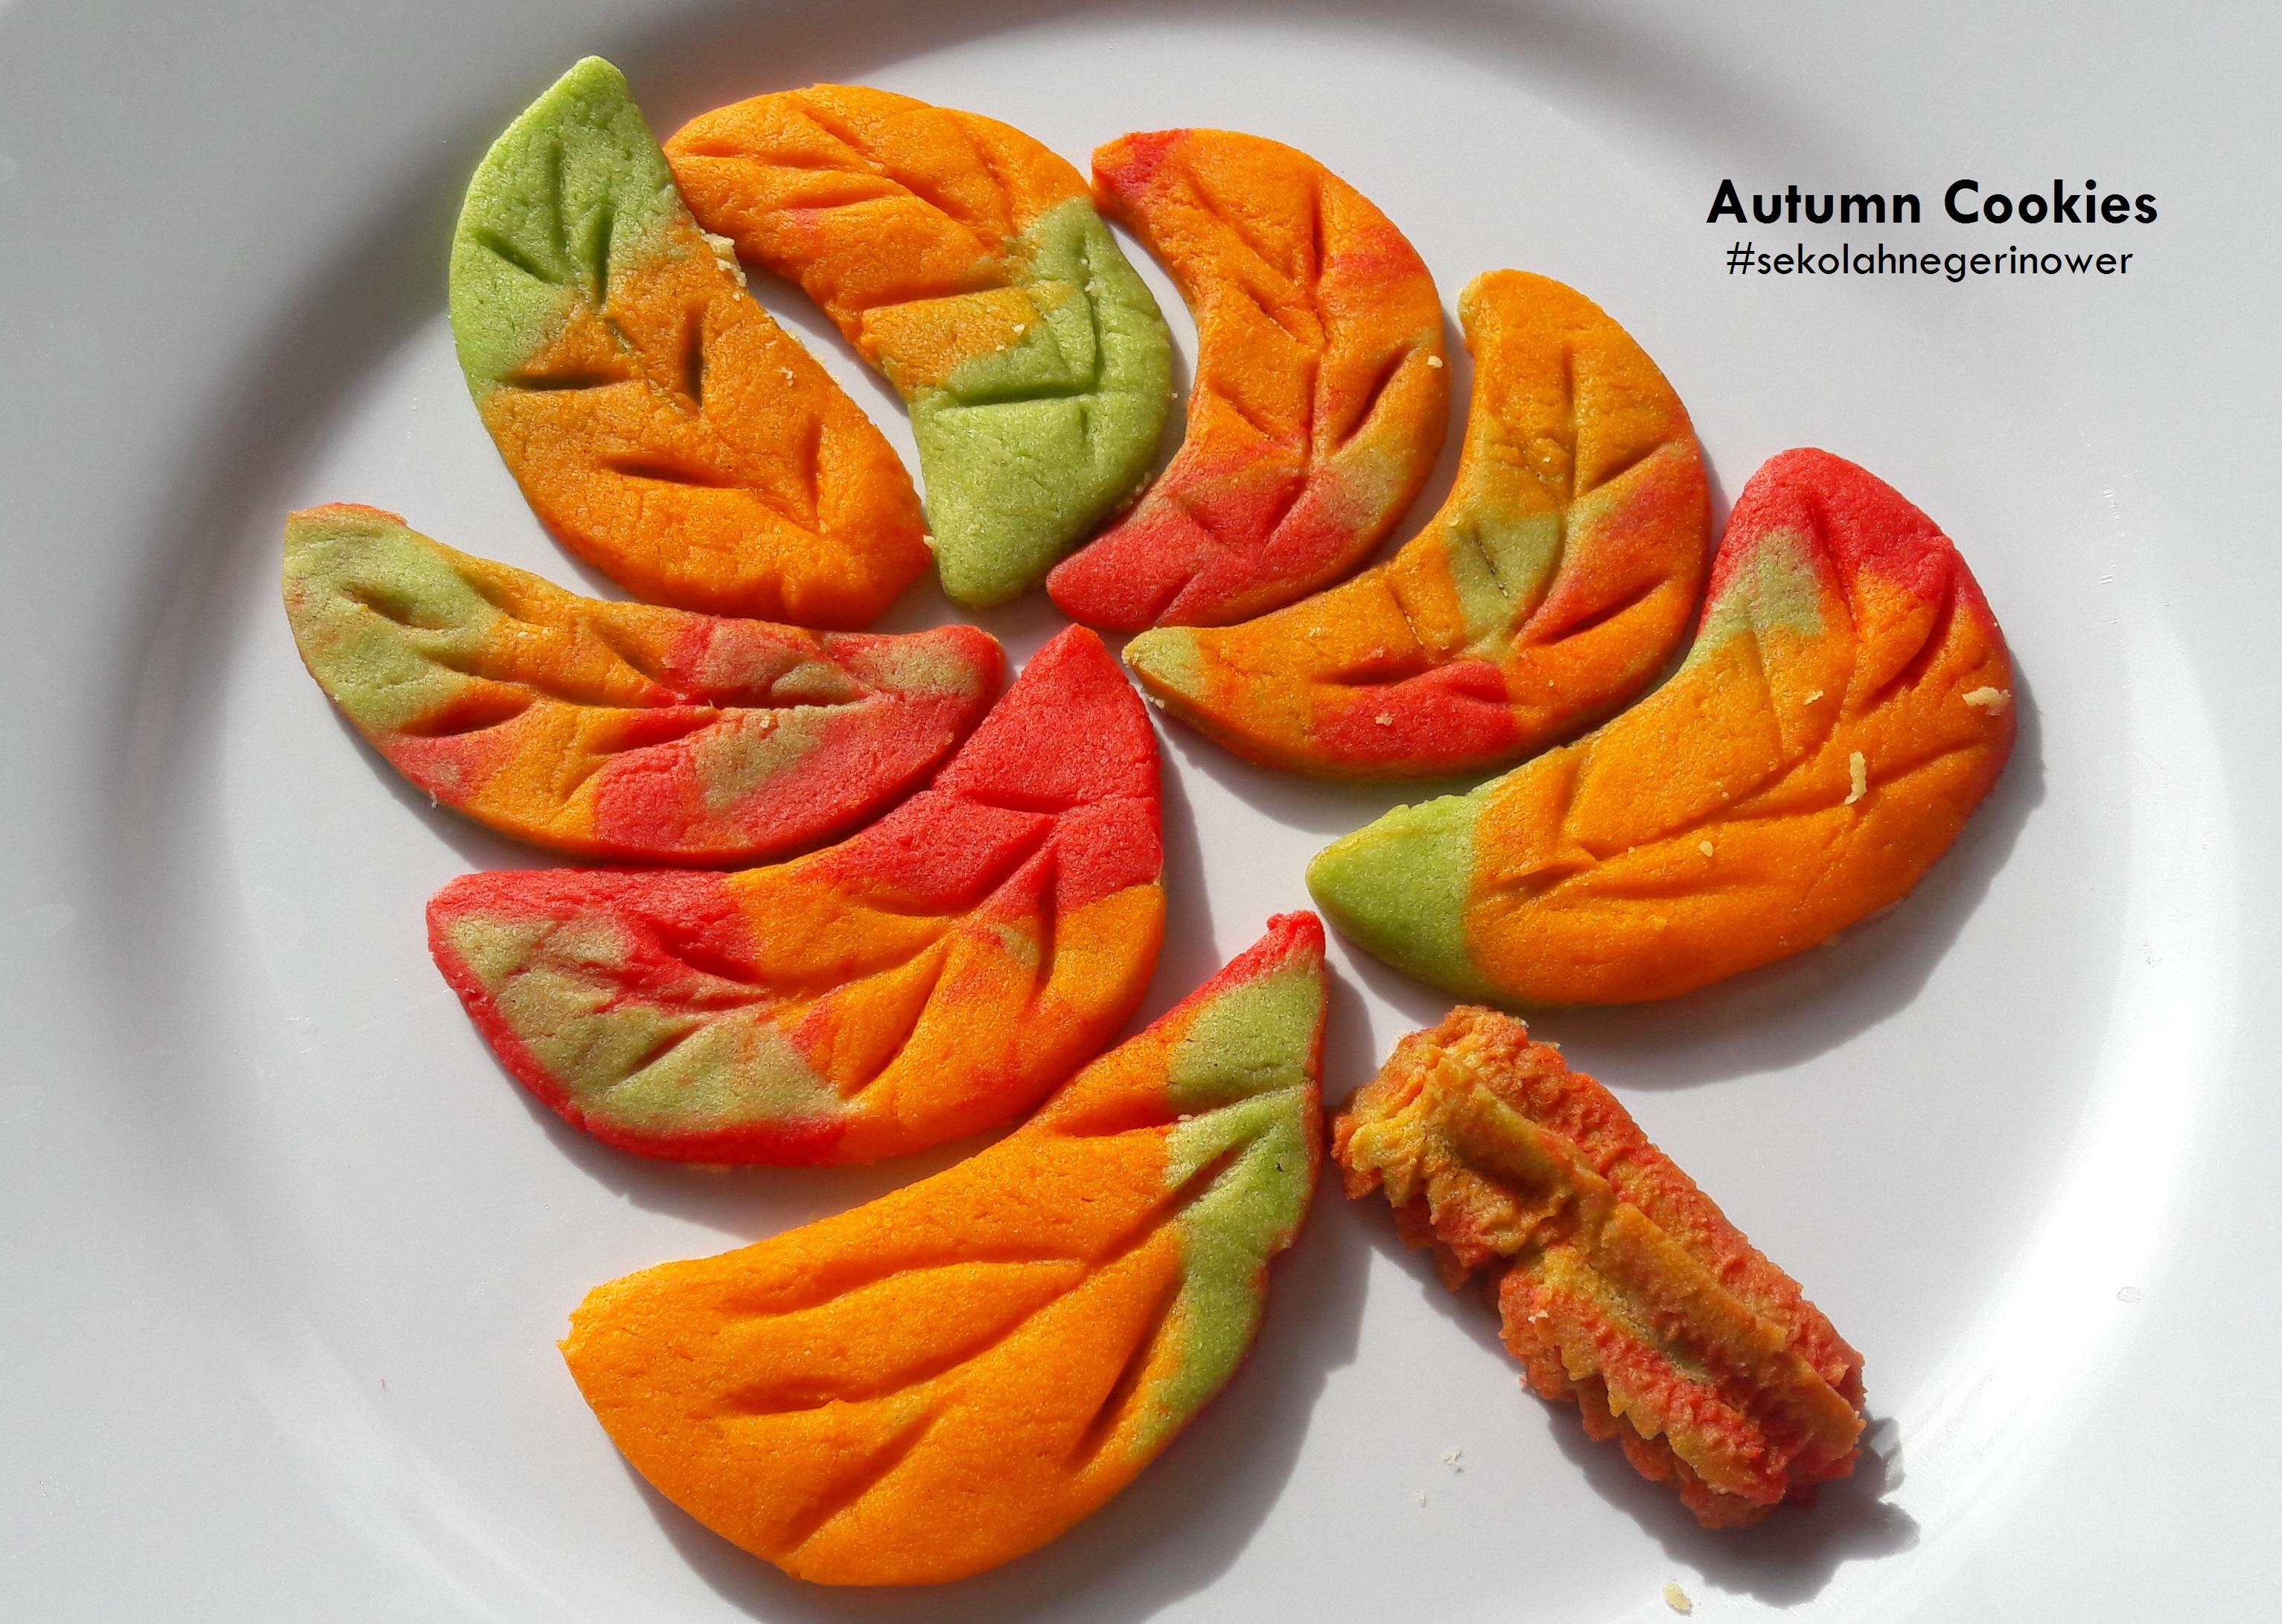 Autumn Cookies edit